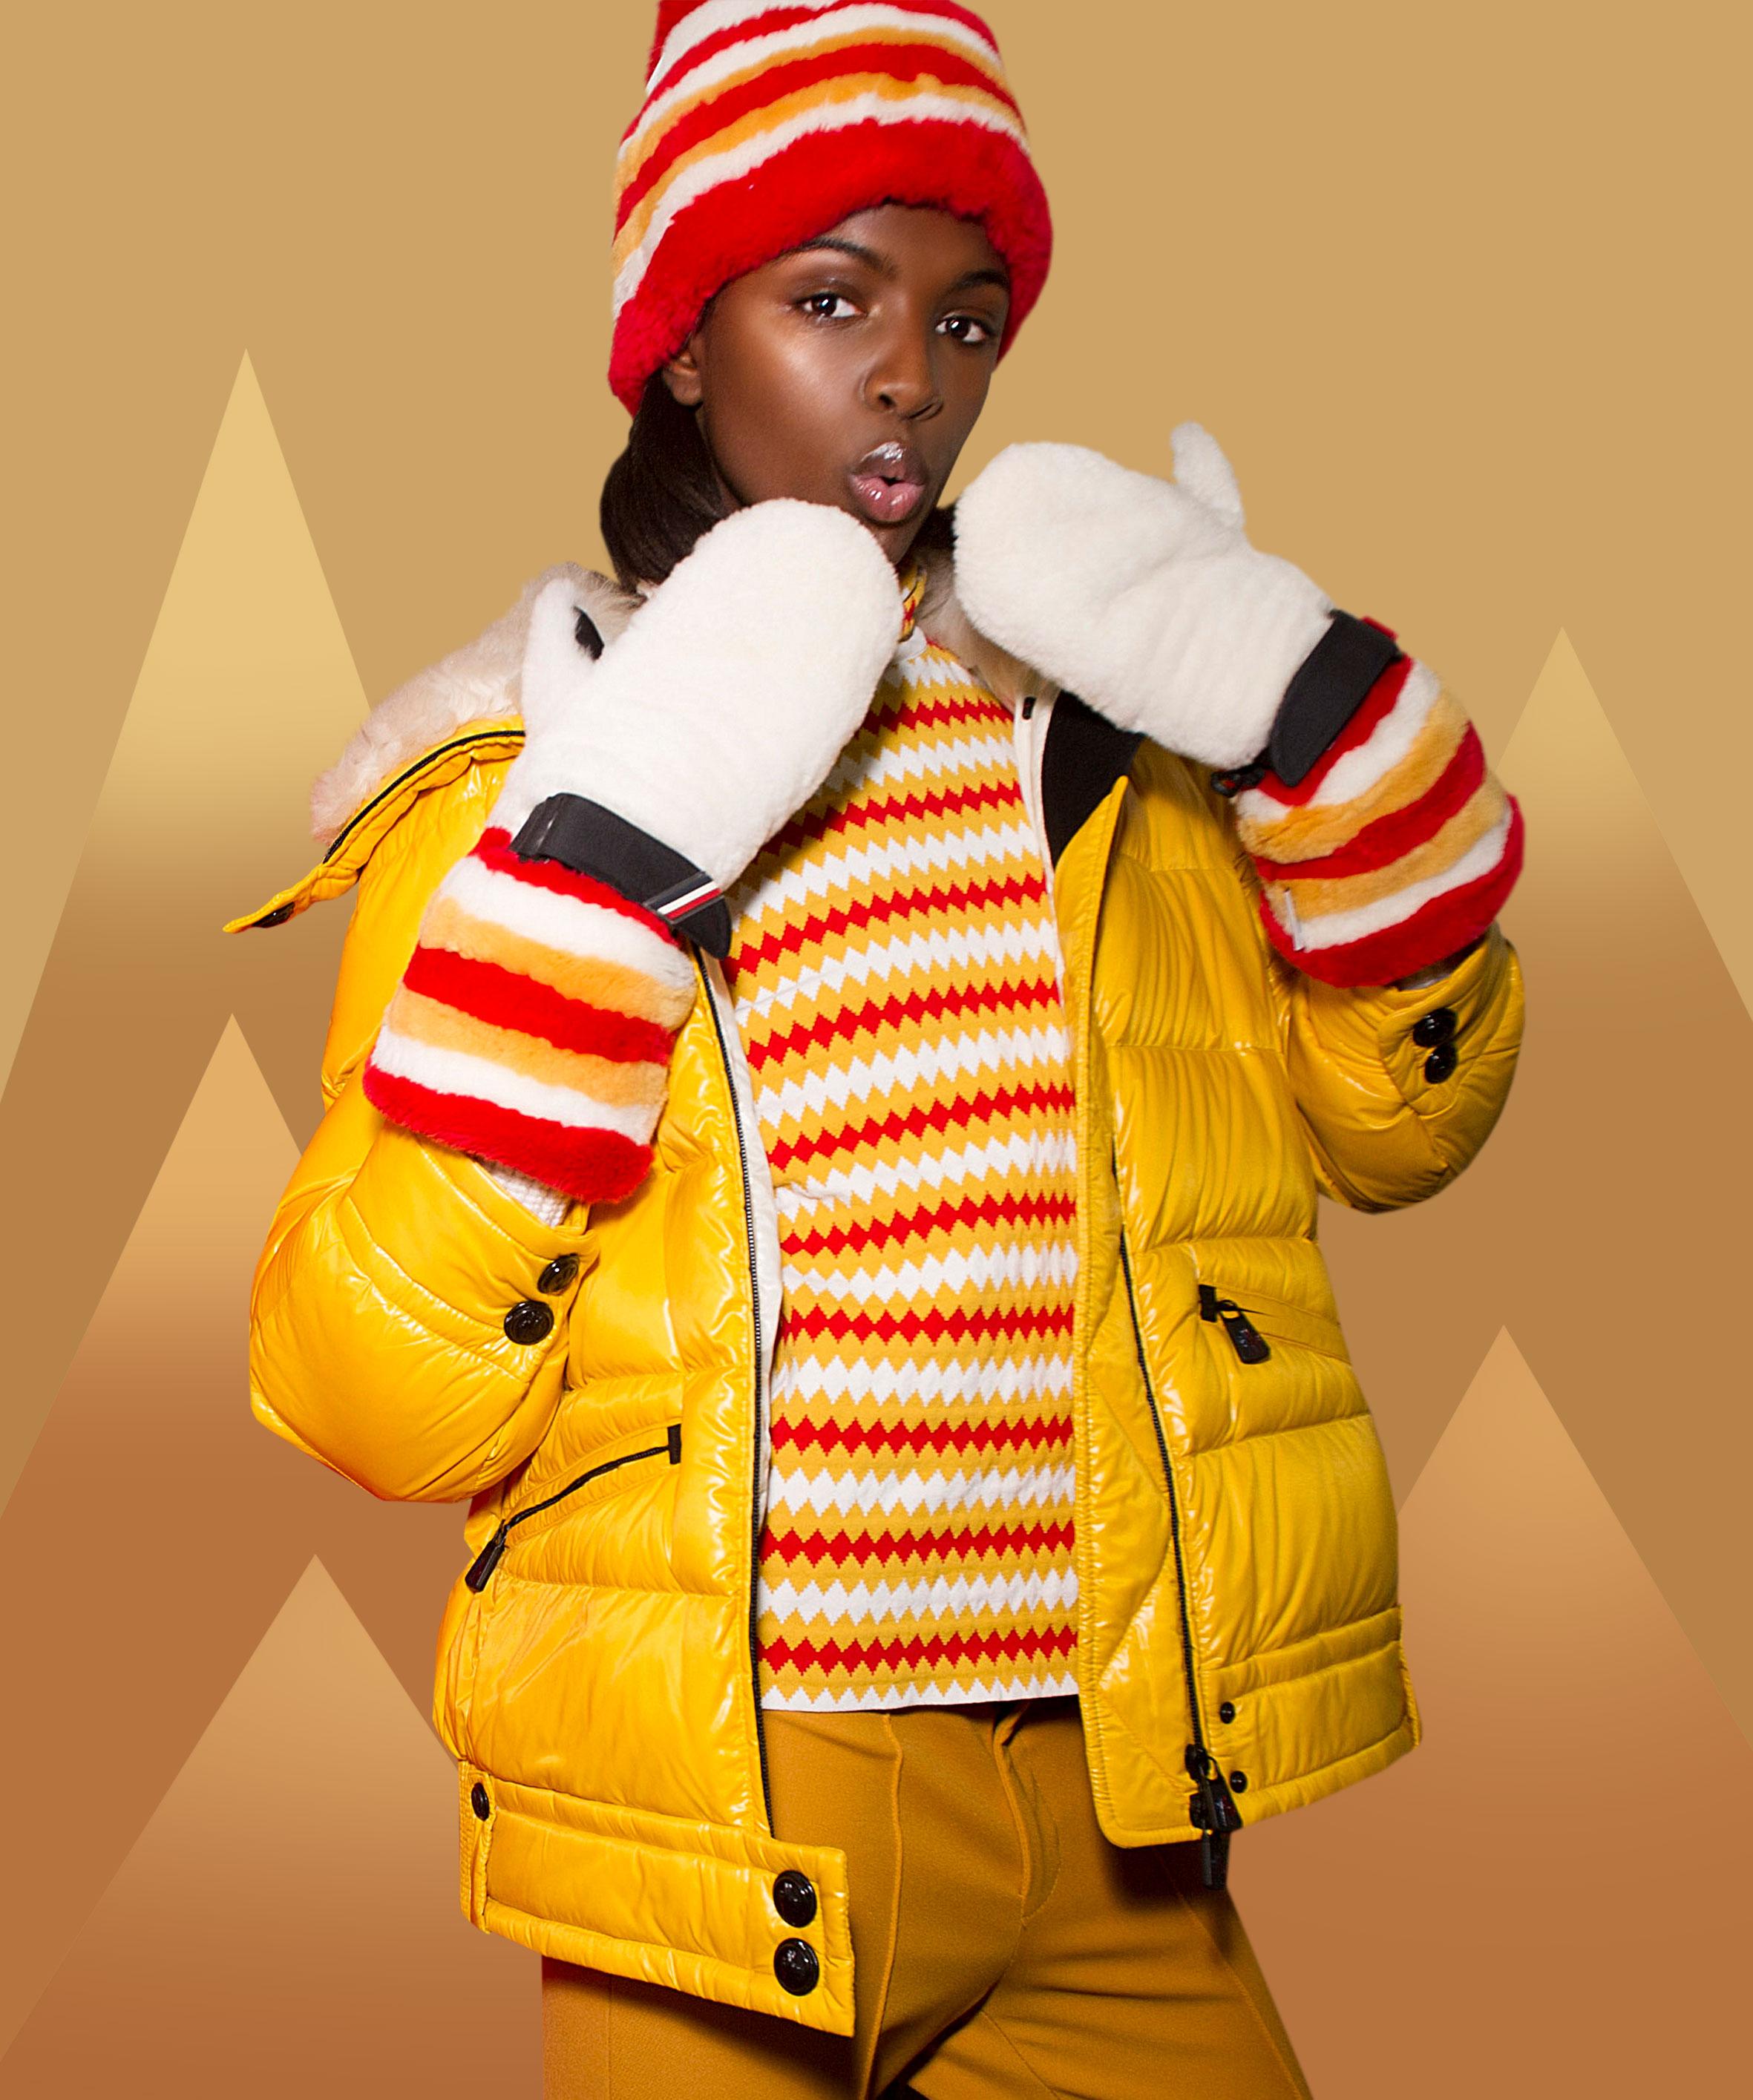 Ski suit by Moncler